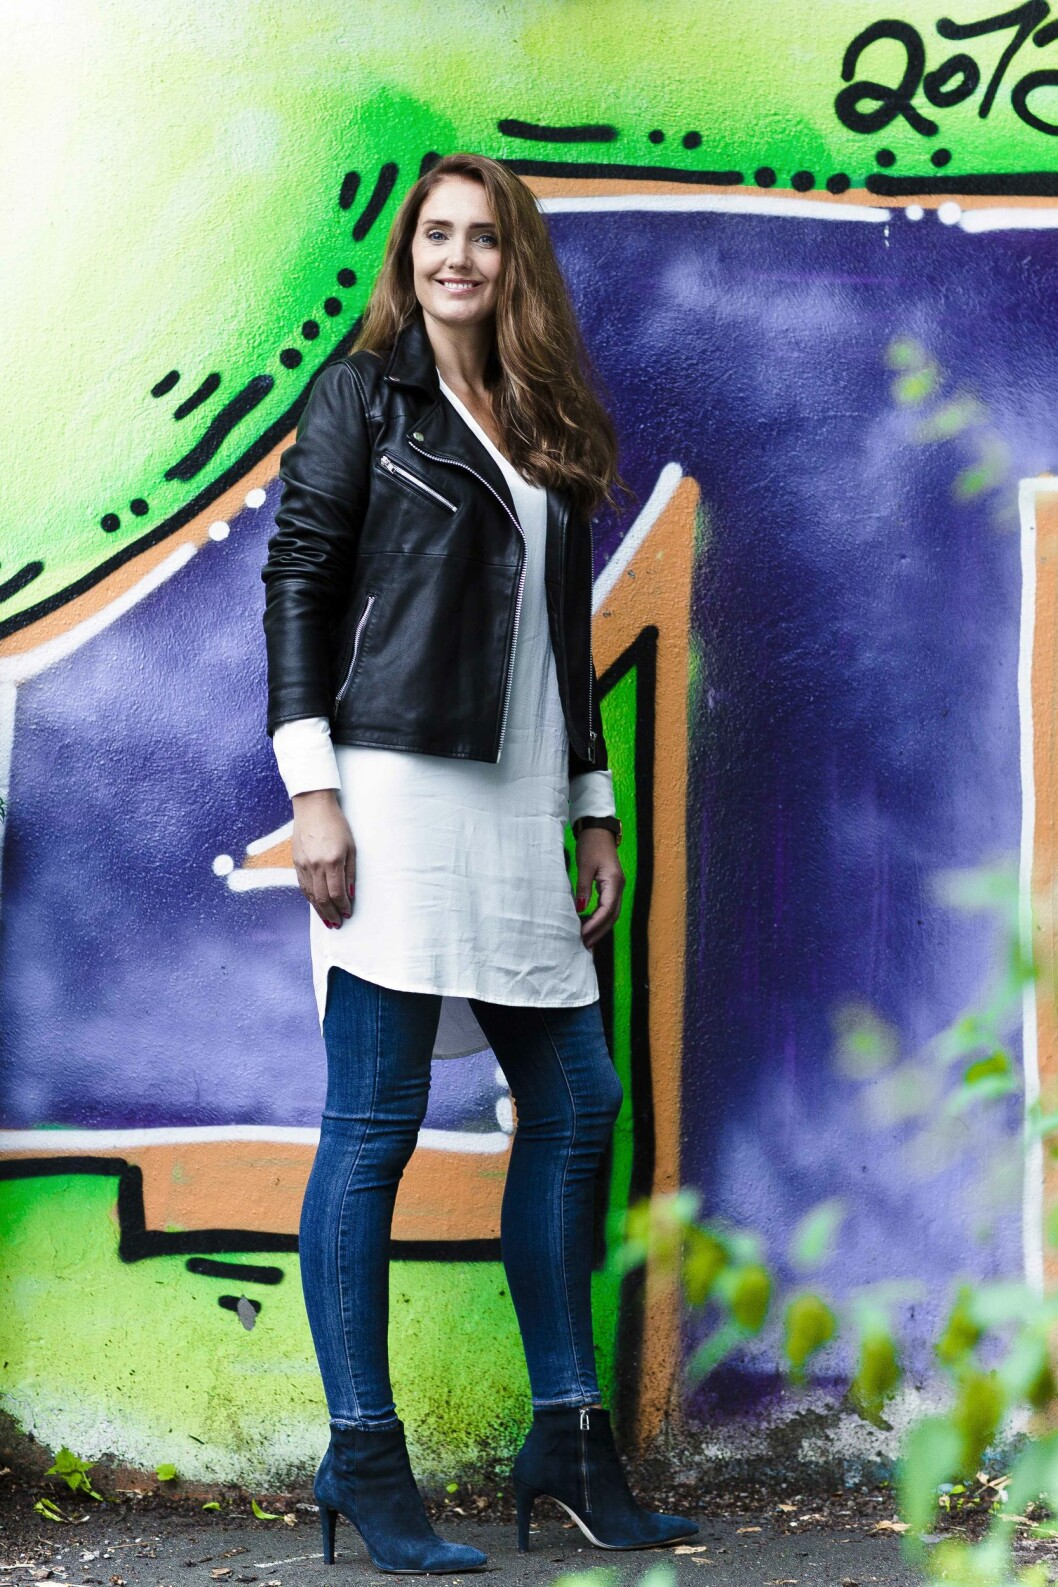 <strong>TØFF LOOK:</strong> Smale jeans funker til det meste, også under en enkel skjortekjole. Sleng en skinnjakke over for en røffere look!  Foto: Astrid Waller